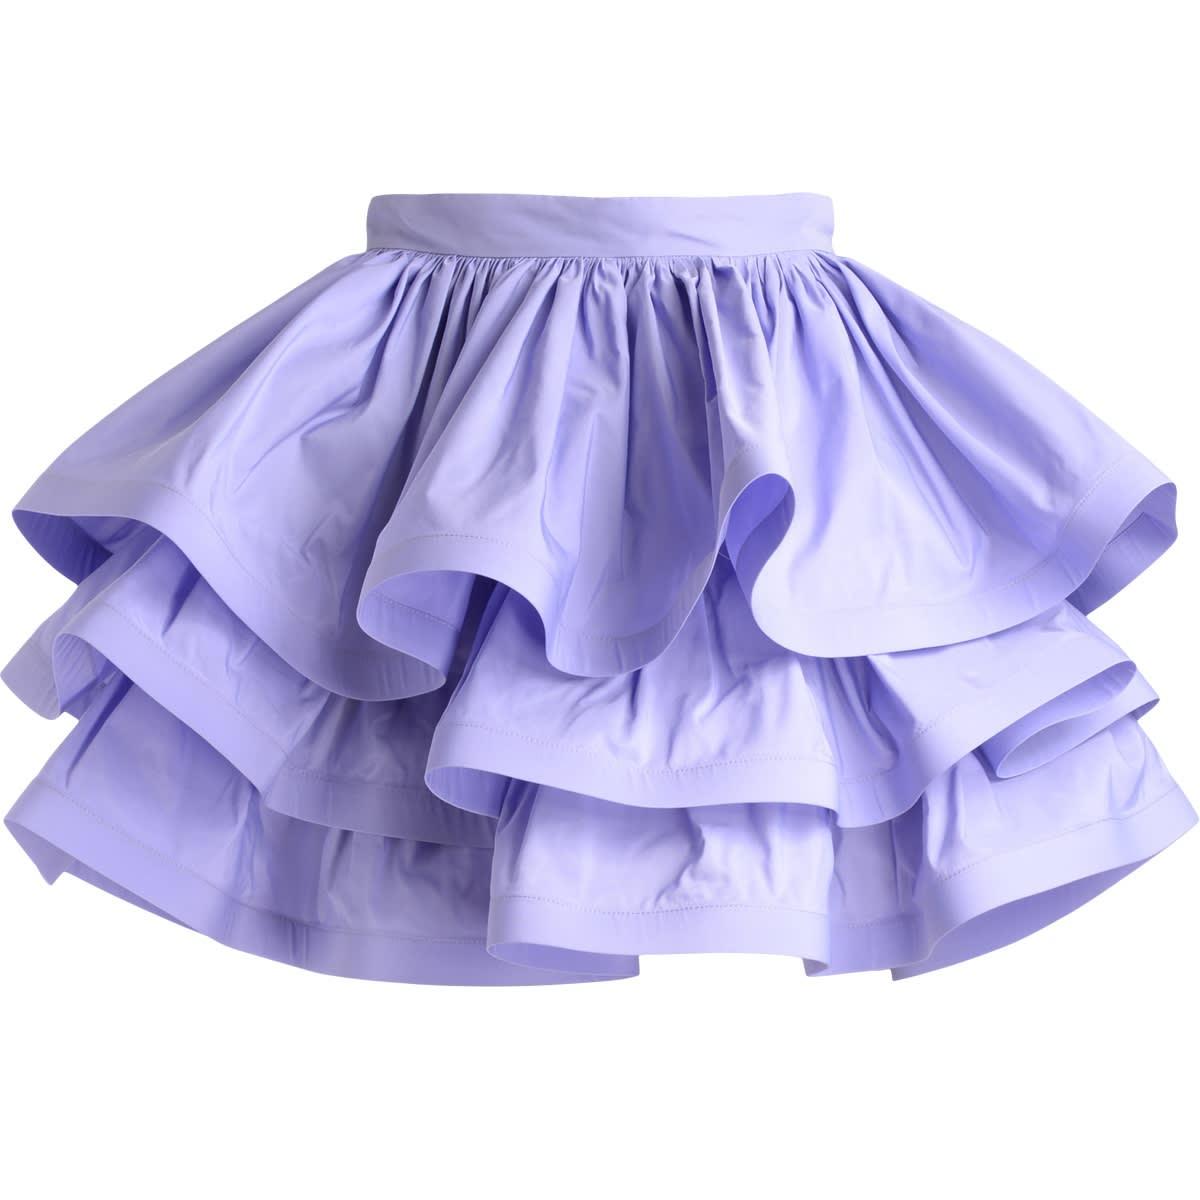 Flounced Skirt Elisabetta Franchi Lavender